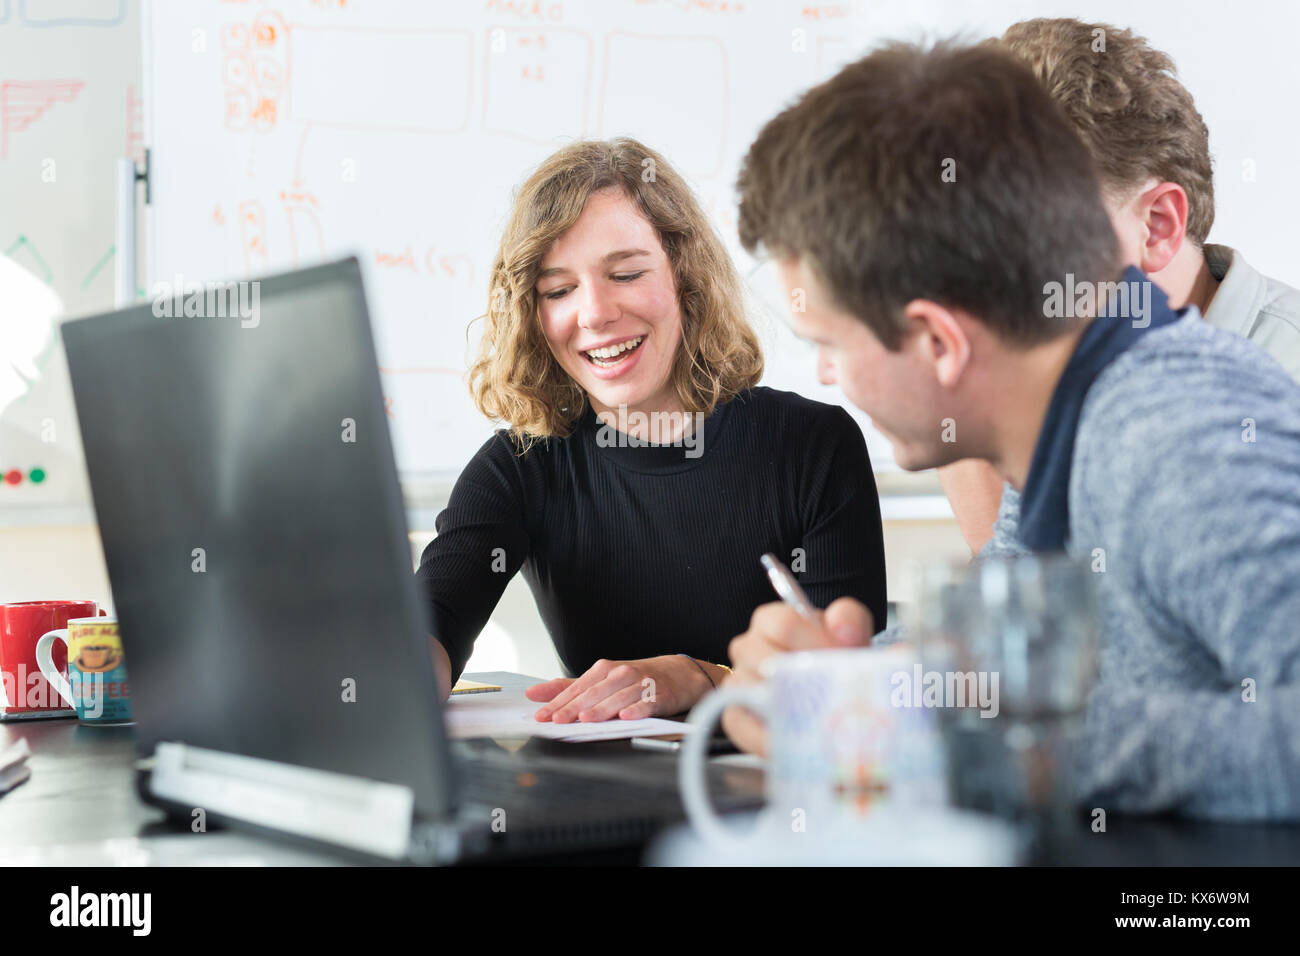 Es relajado e informal Inicio Empresa Empresa Equipo reunión. Imagen De Stock